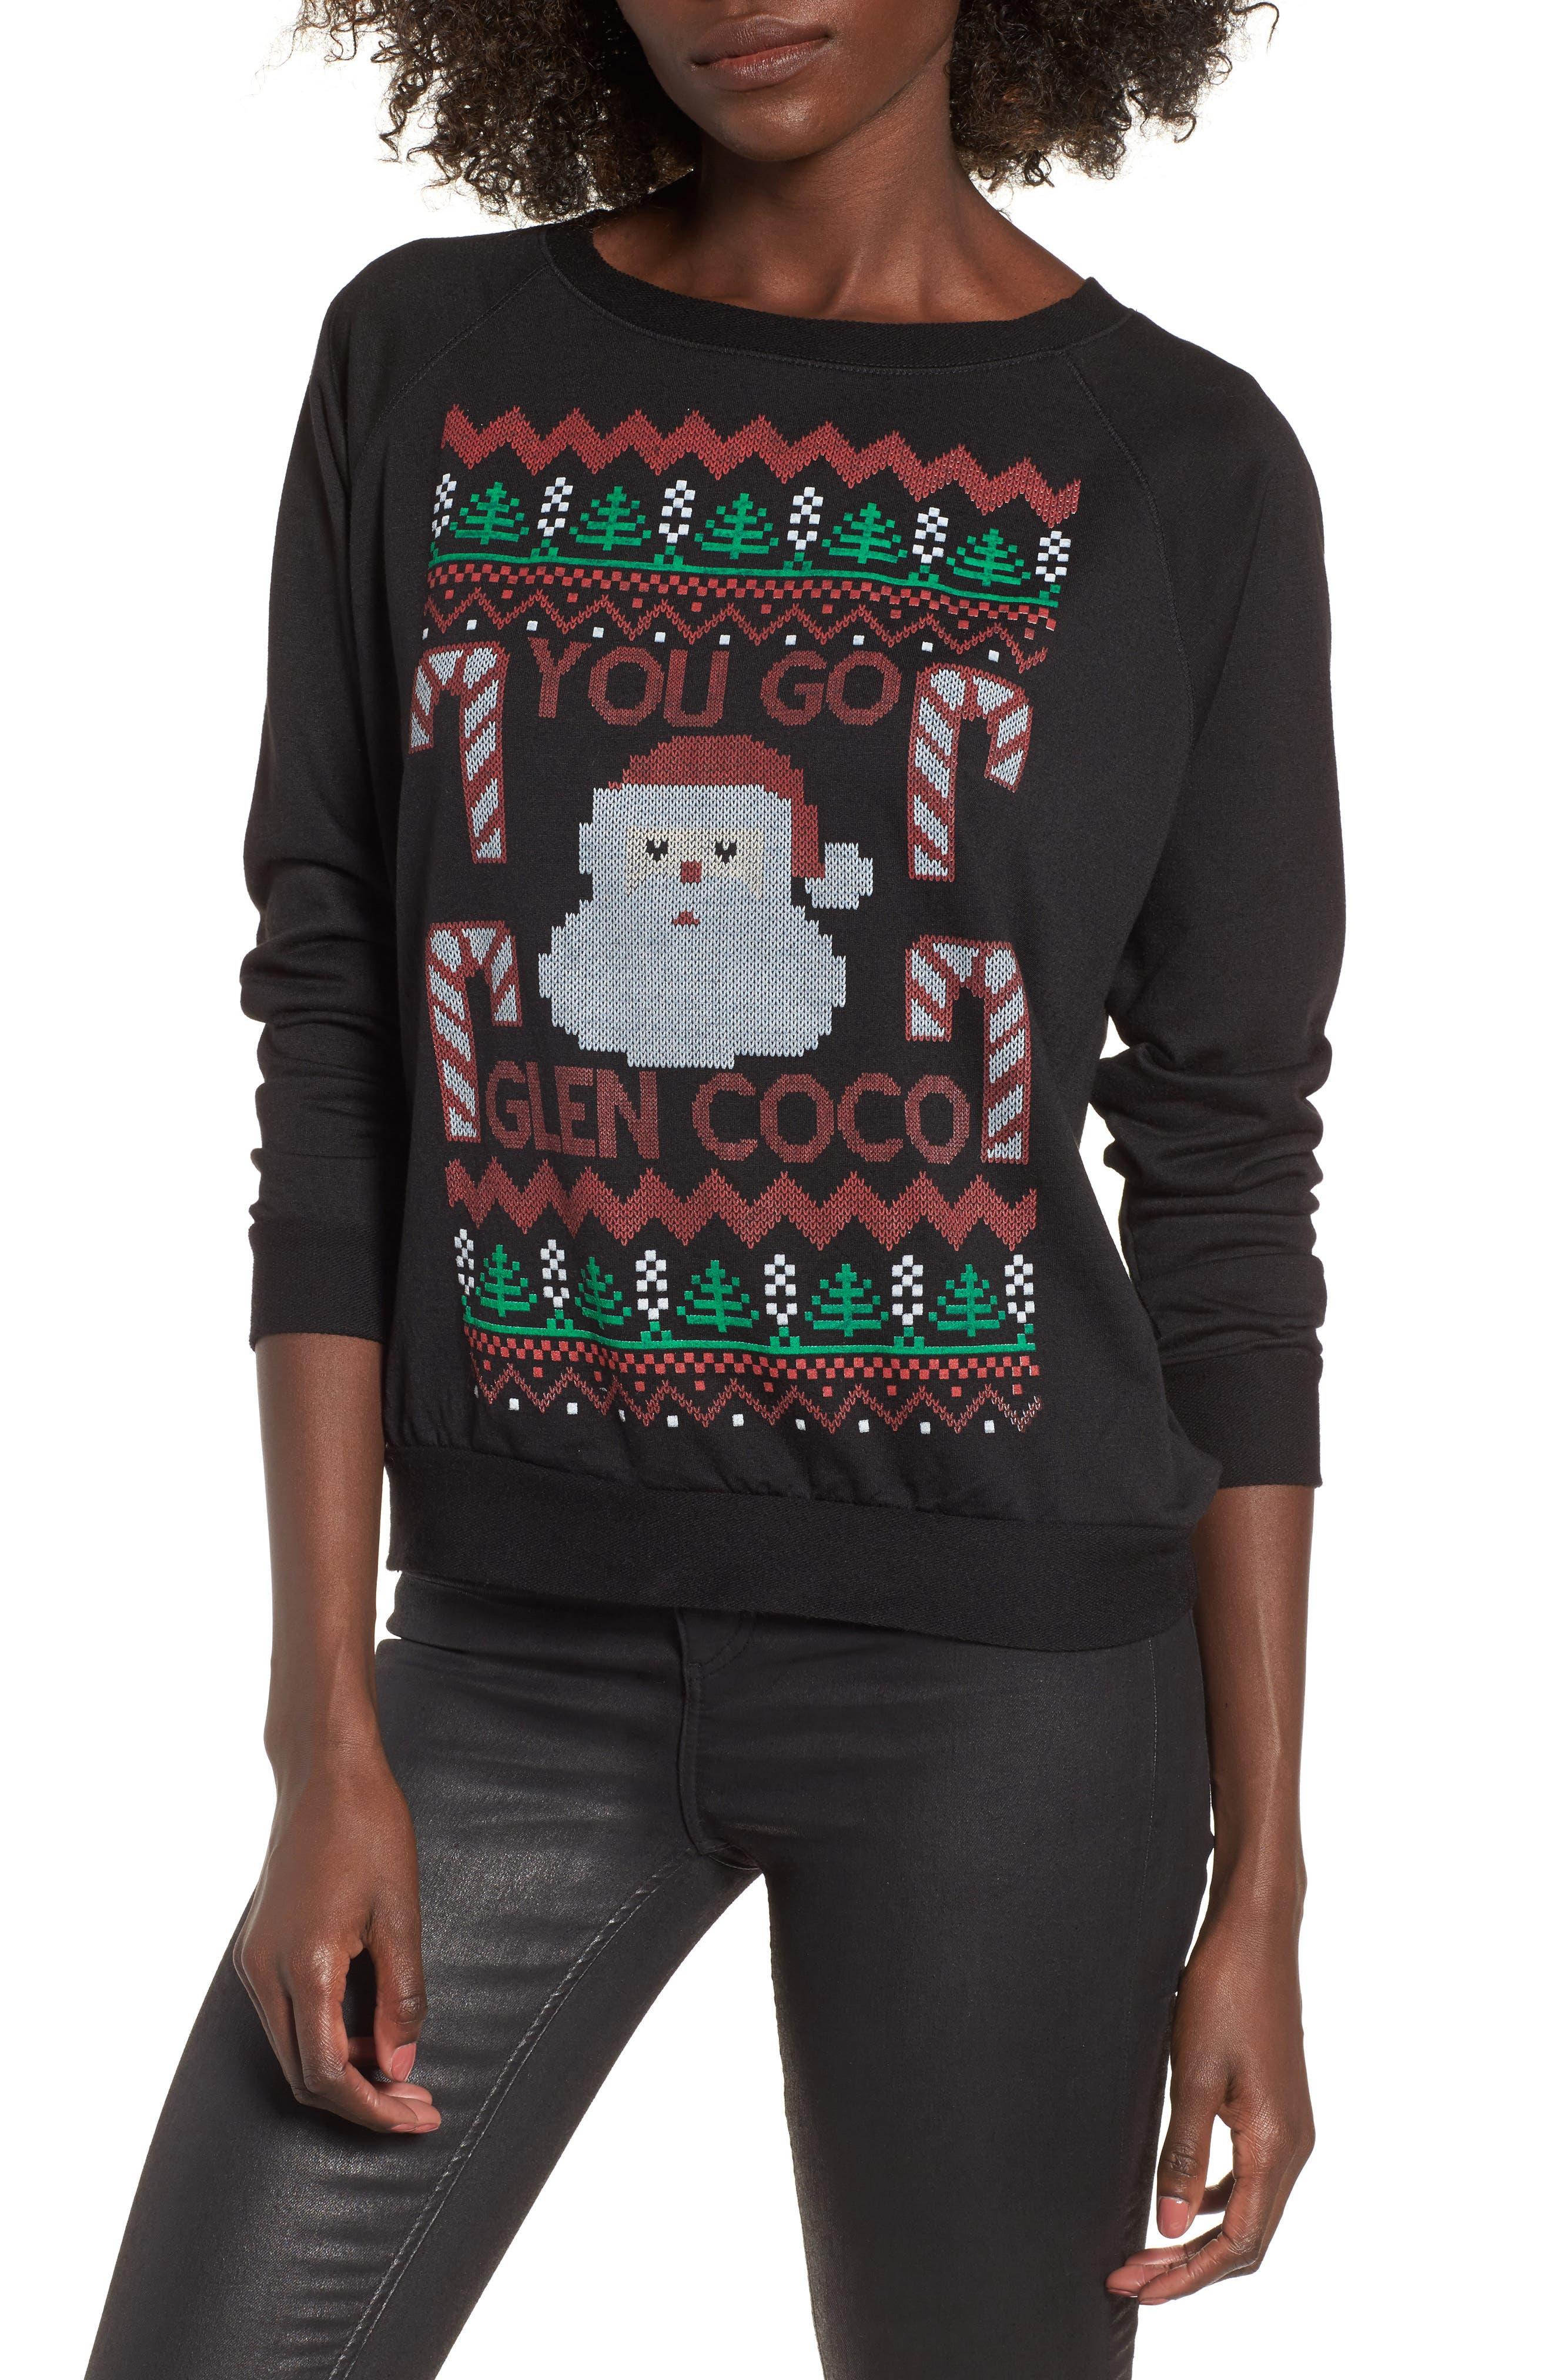 Main Image - Prince Peter You Go Glen Coco Sweatshirt